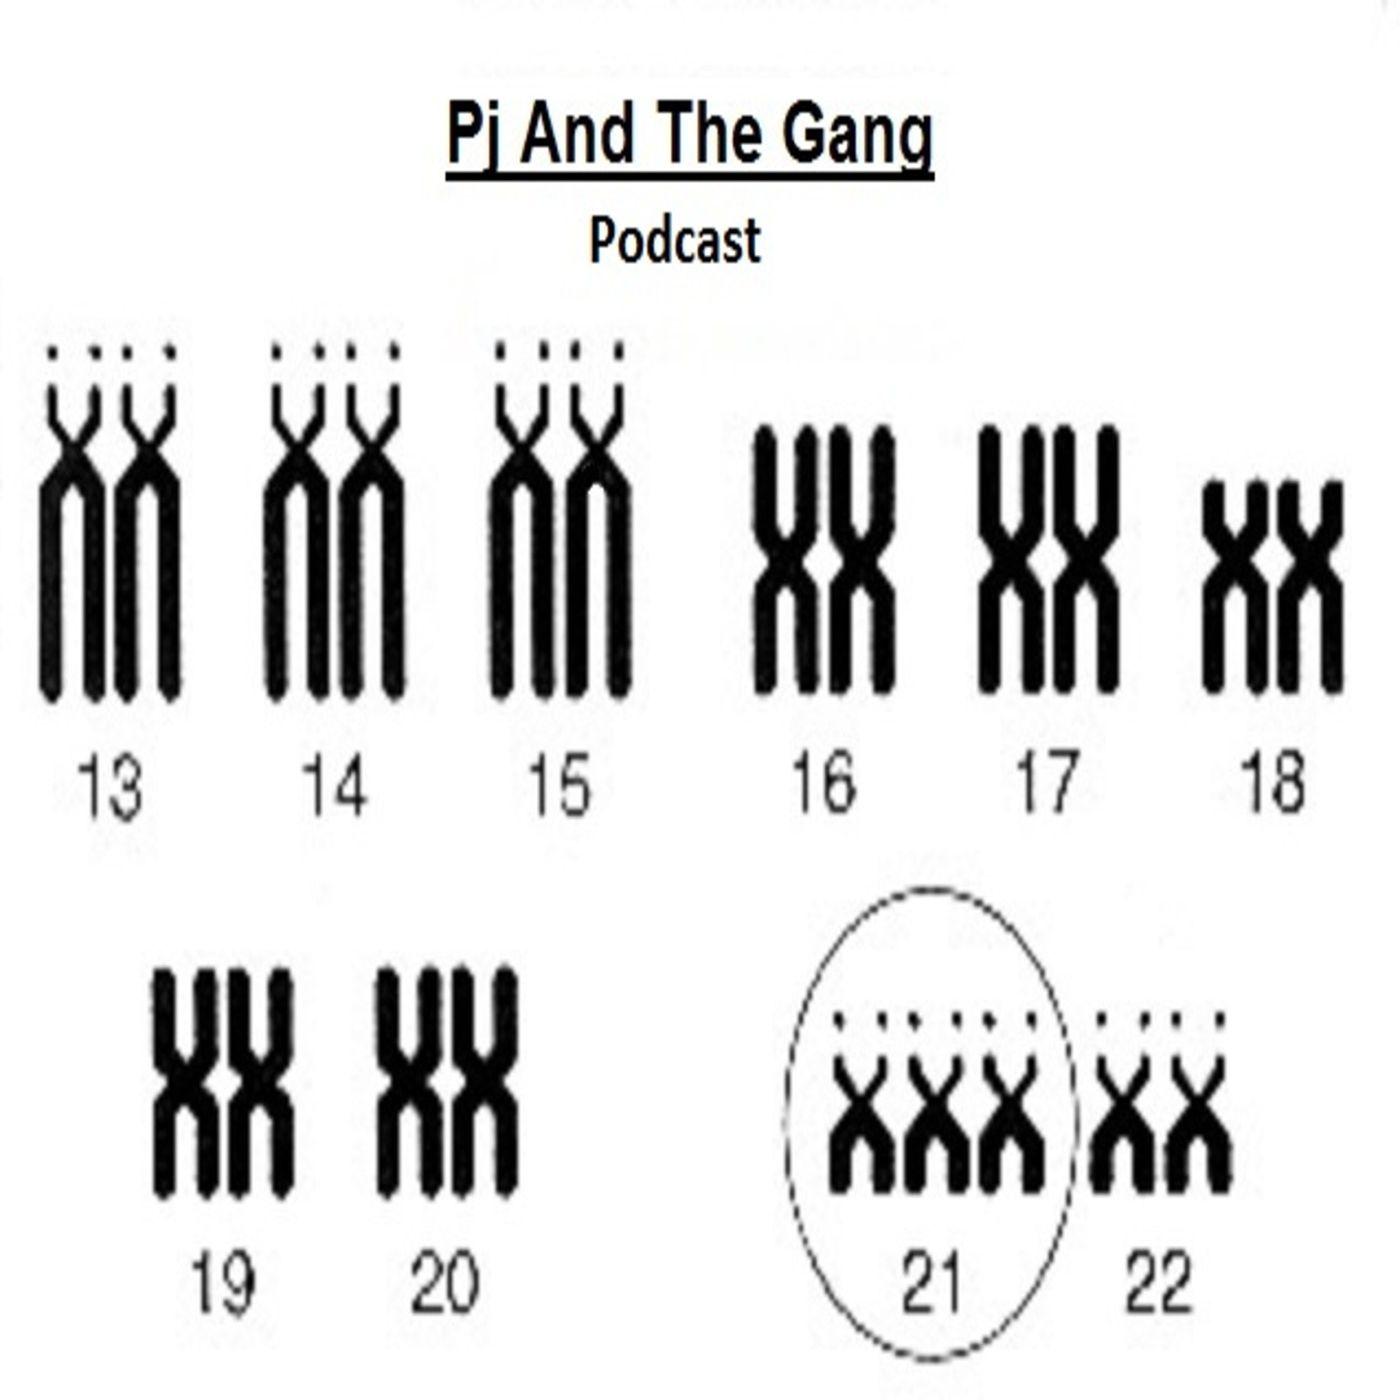 Pj And The Gang